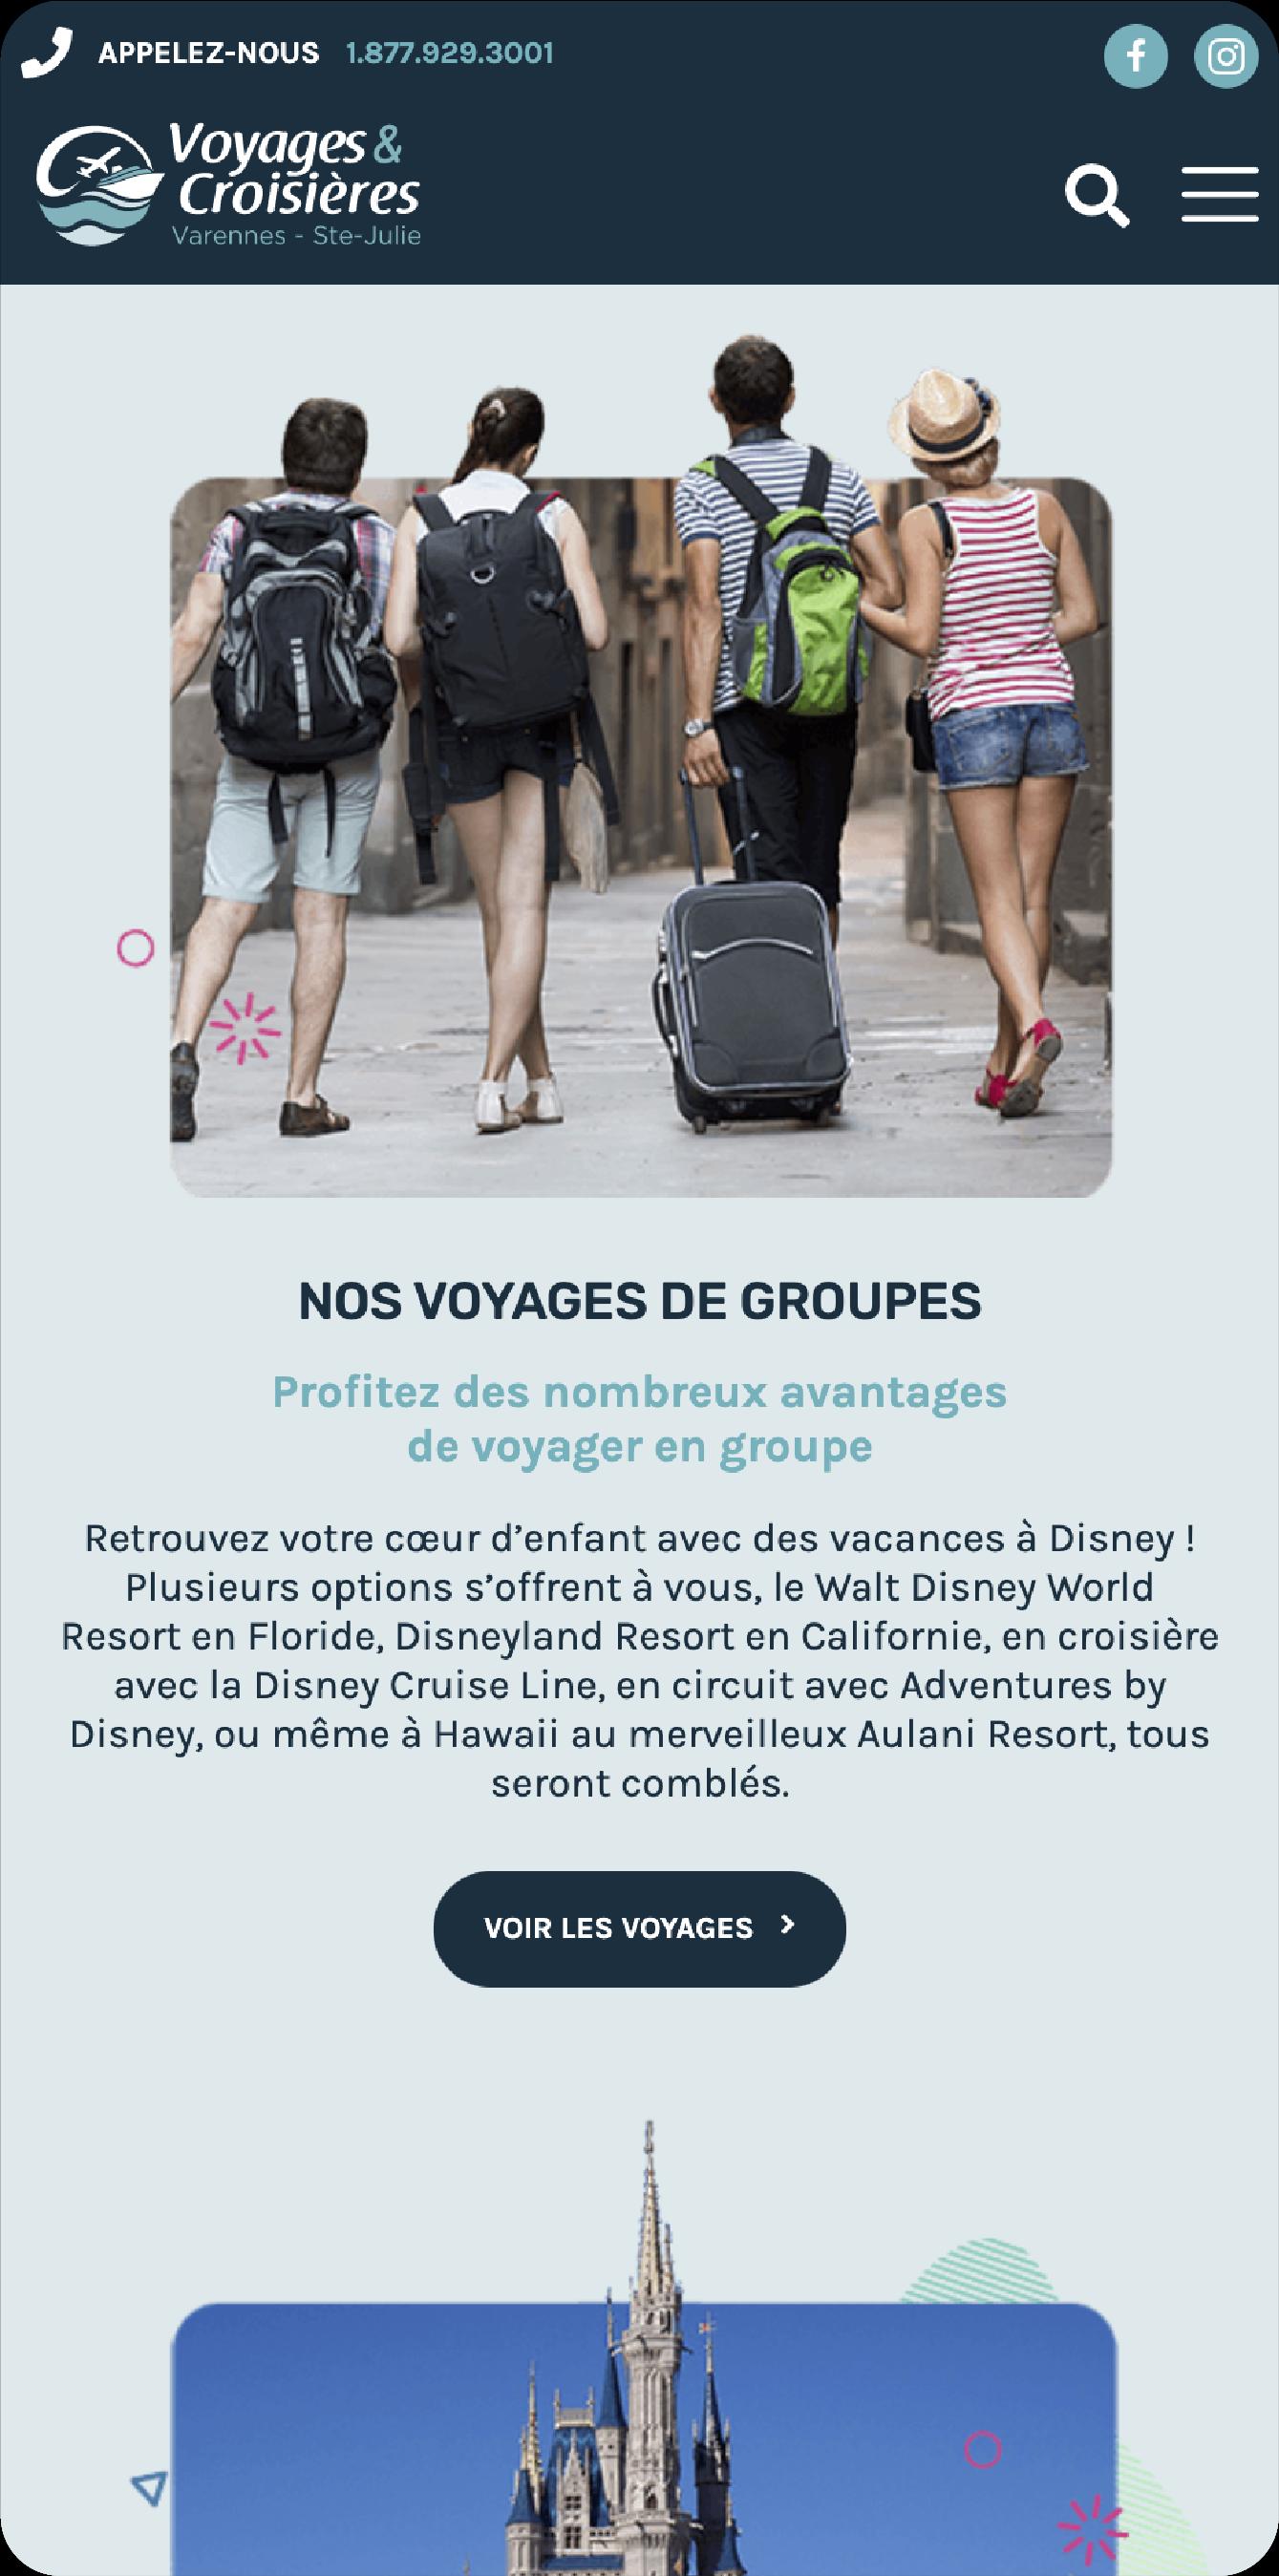 Voyages et croisières Varennes – Ste-Julie site web mobile